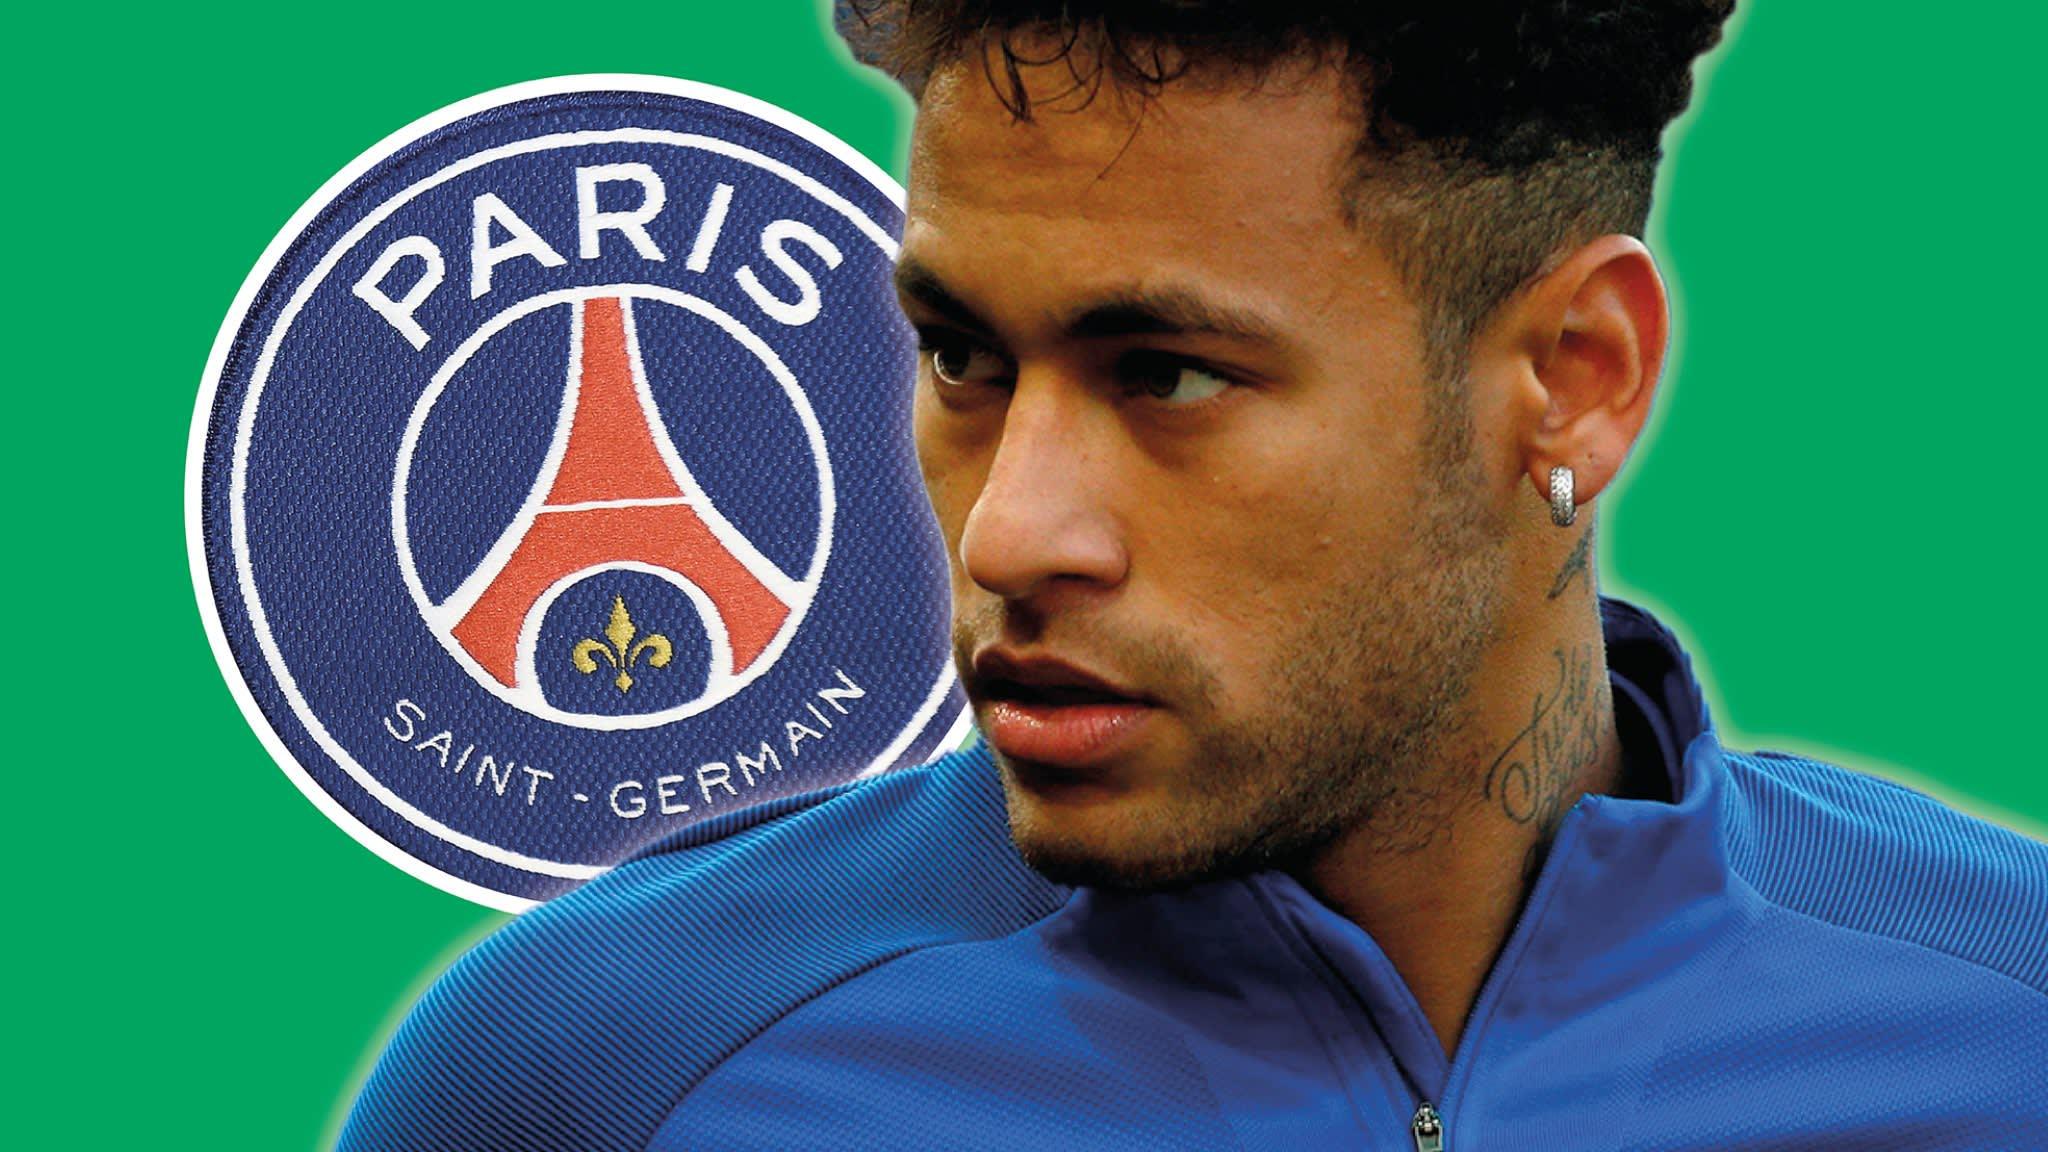 PSG 'overstated' sponsorships worth €200m, says Uefa probe